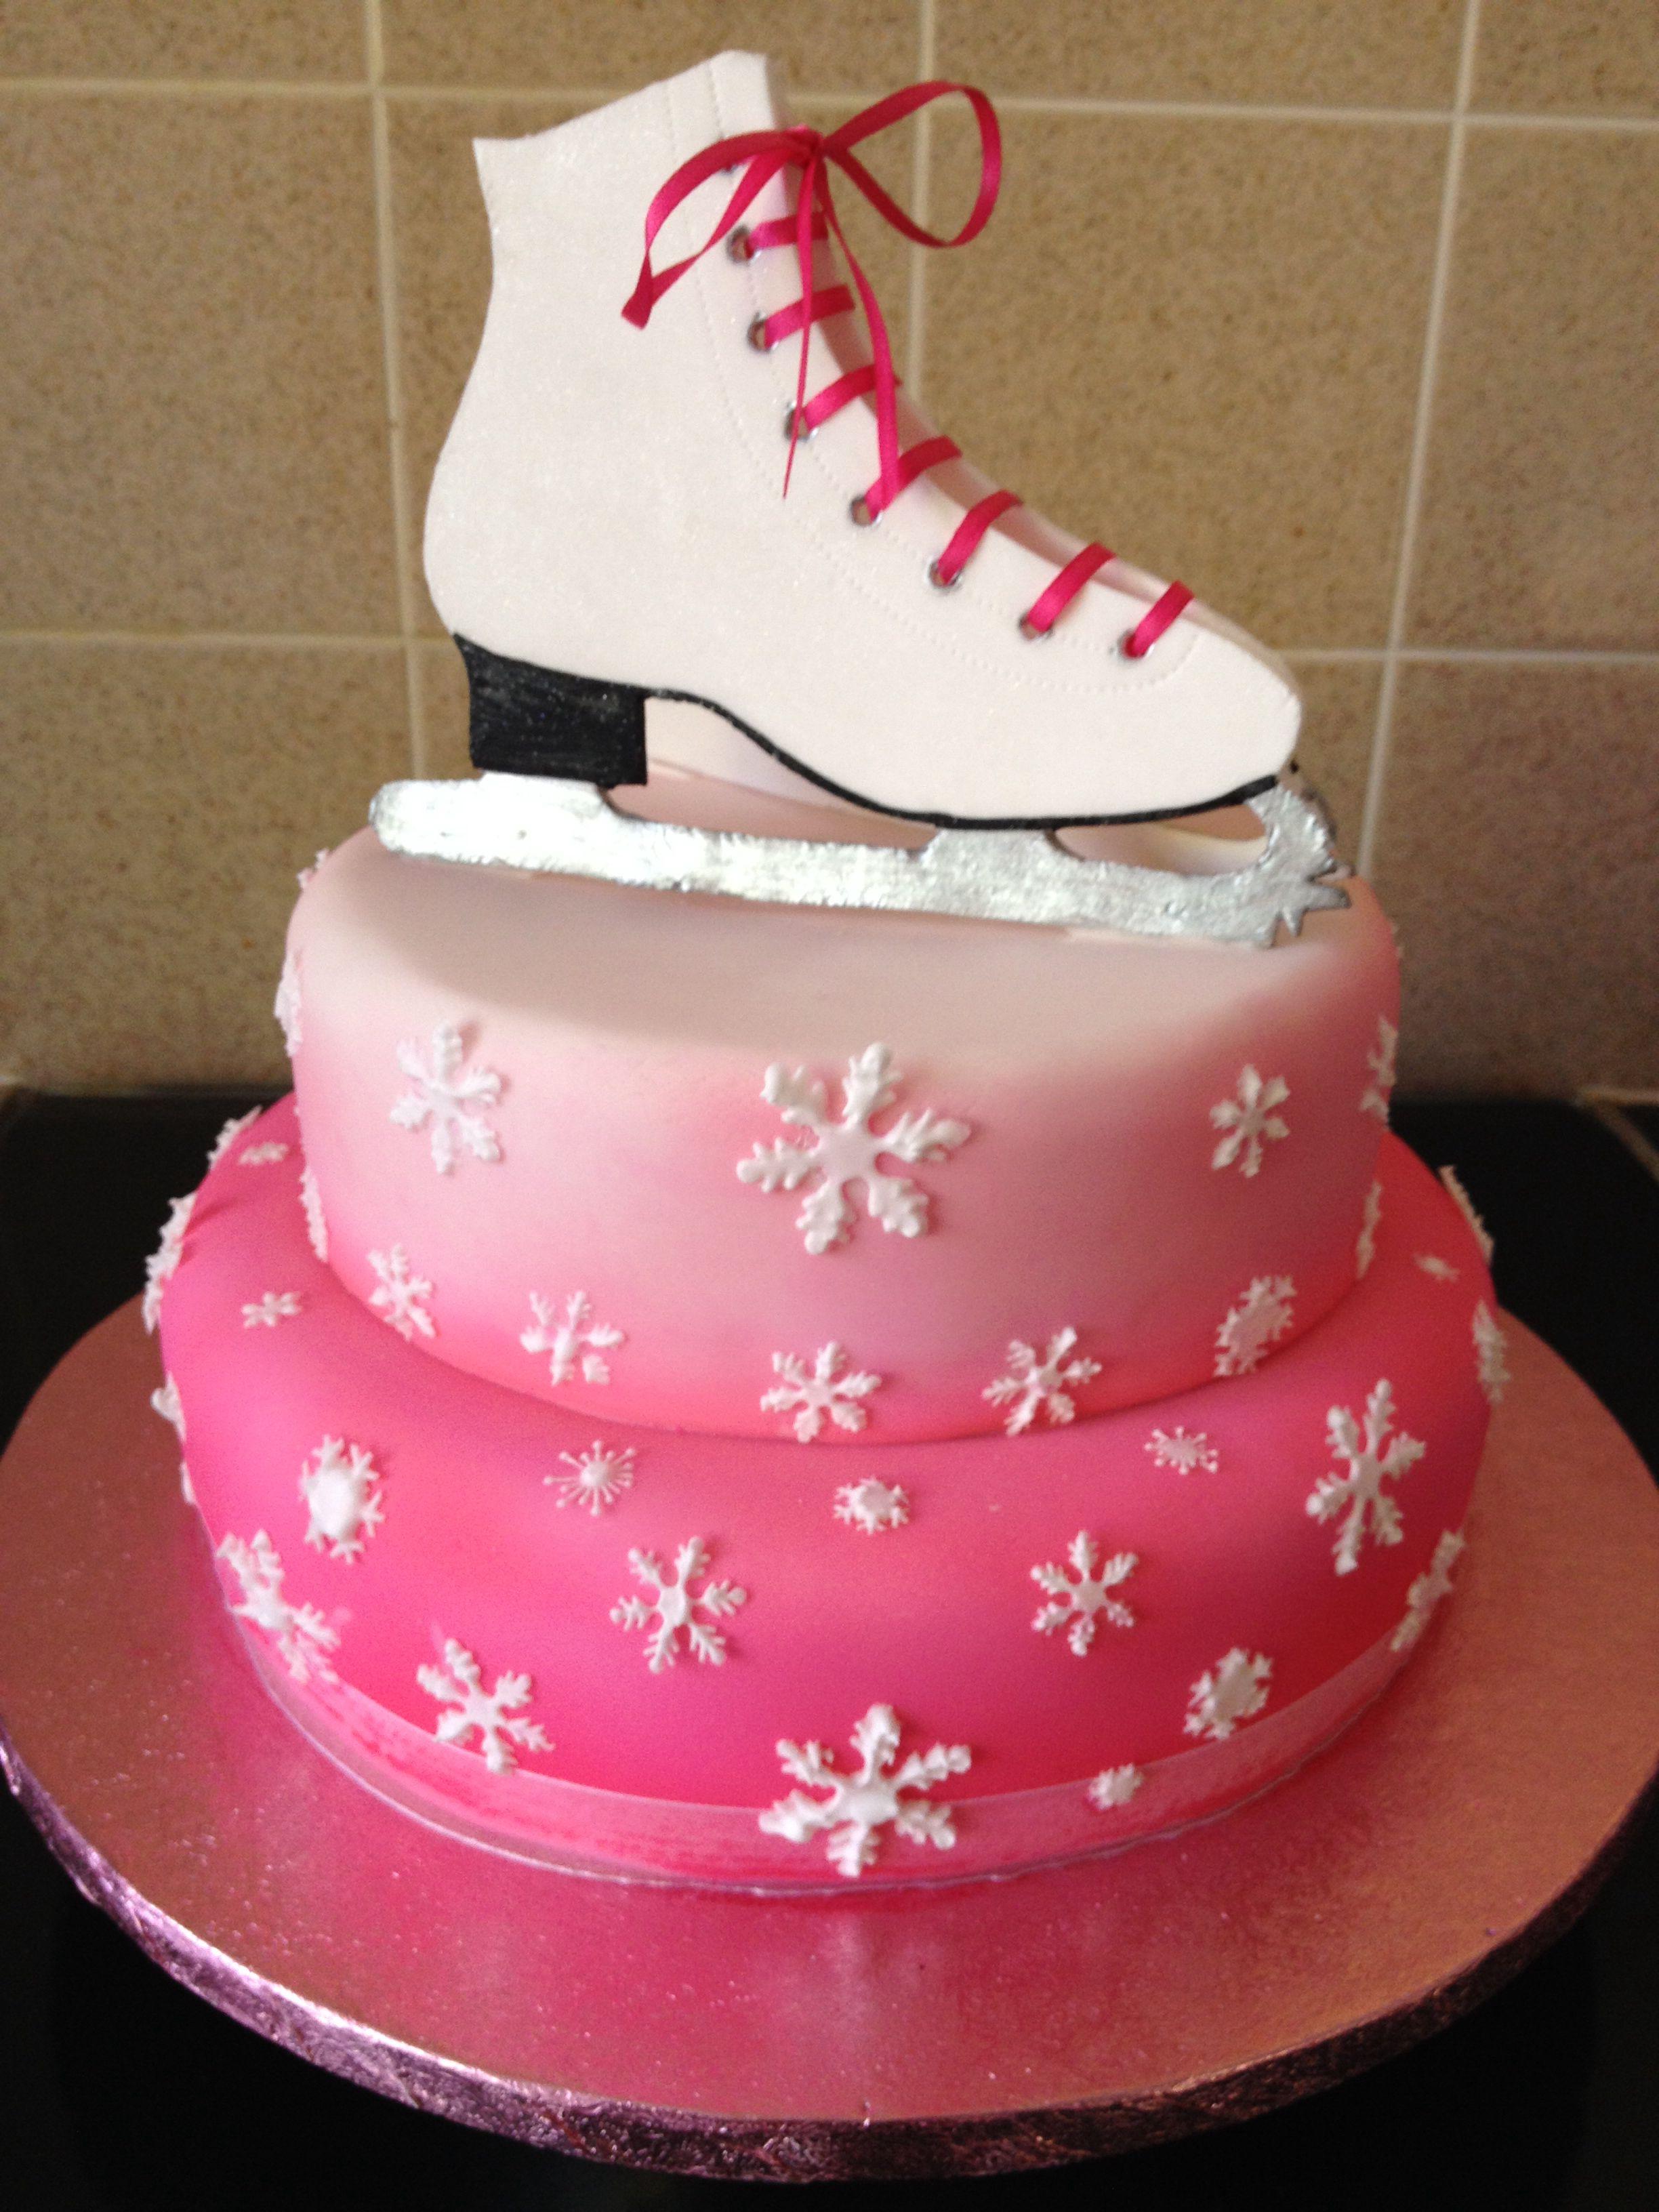 Ice Skating Cake Ice Skating Cake Hockey Birthday Cake Skate